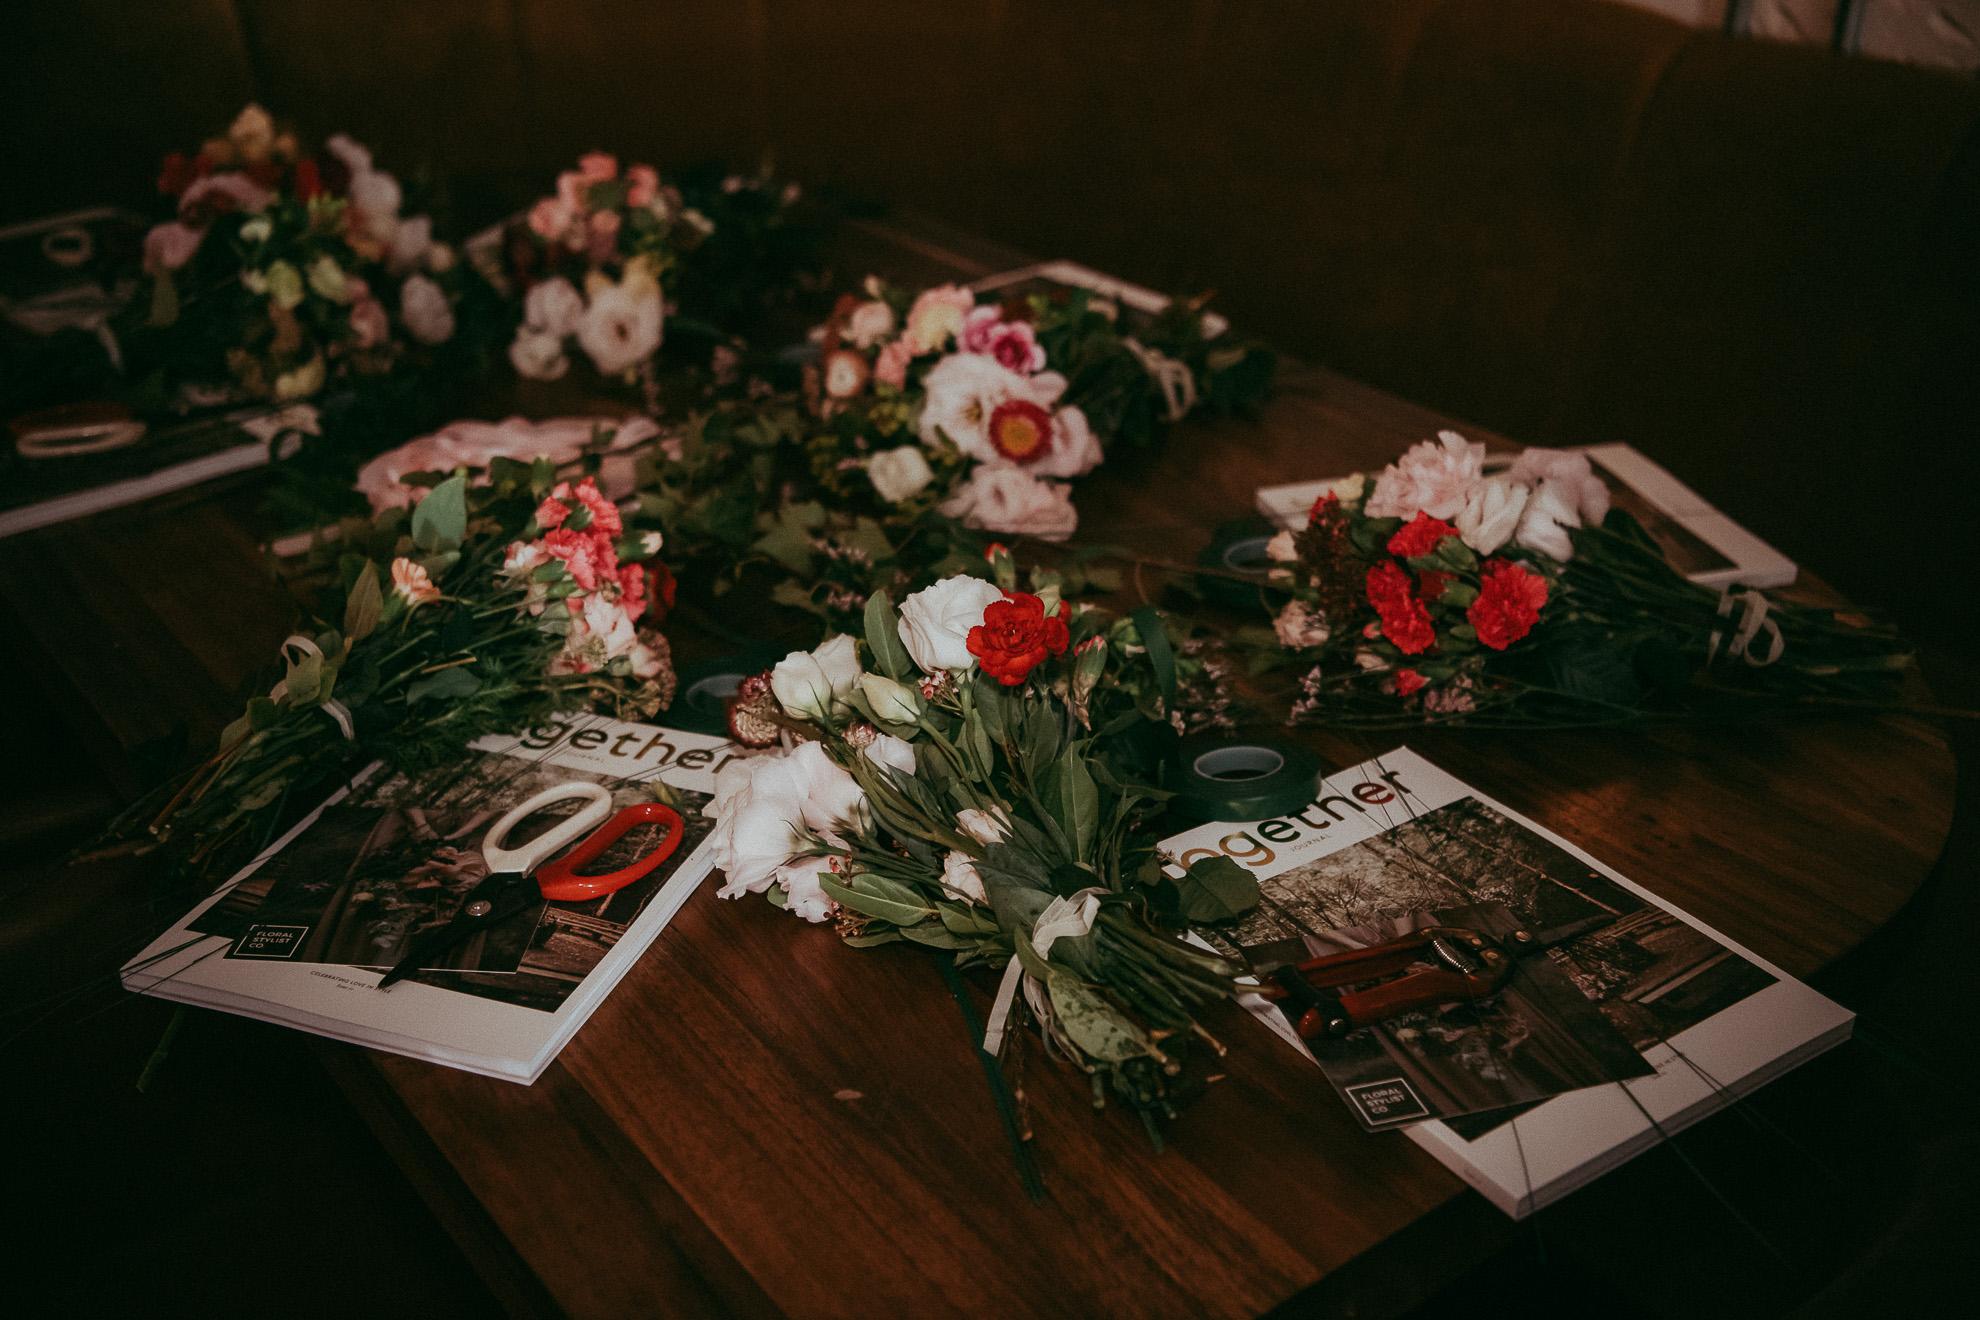 flower-workshop-by-olgalevien-9.jpg